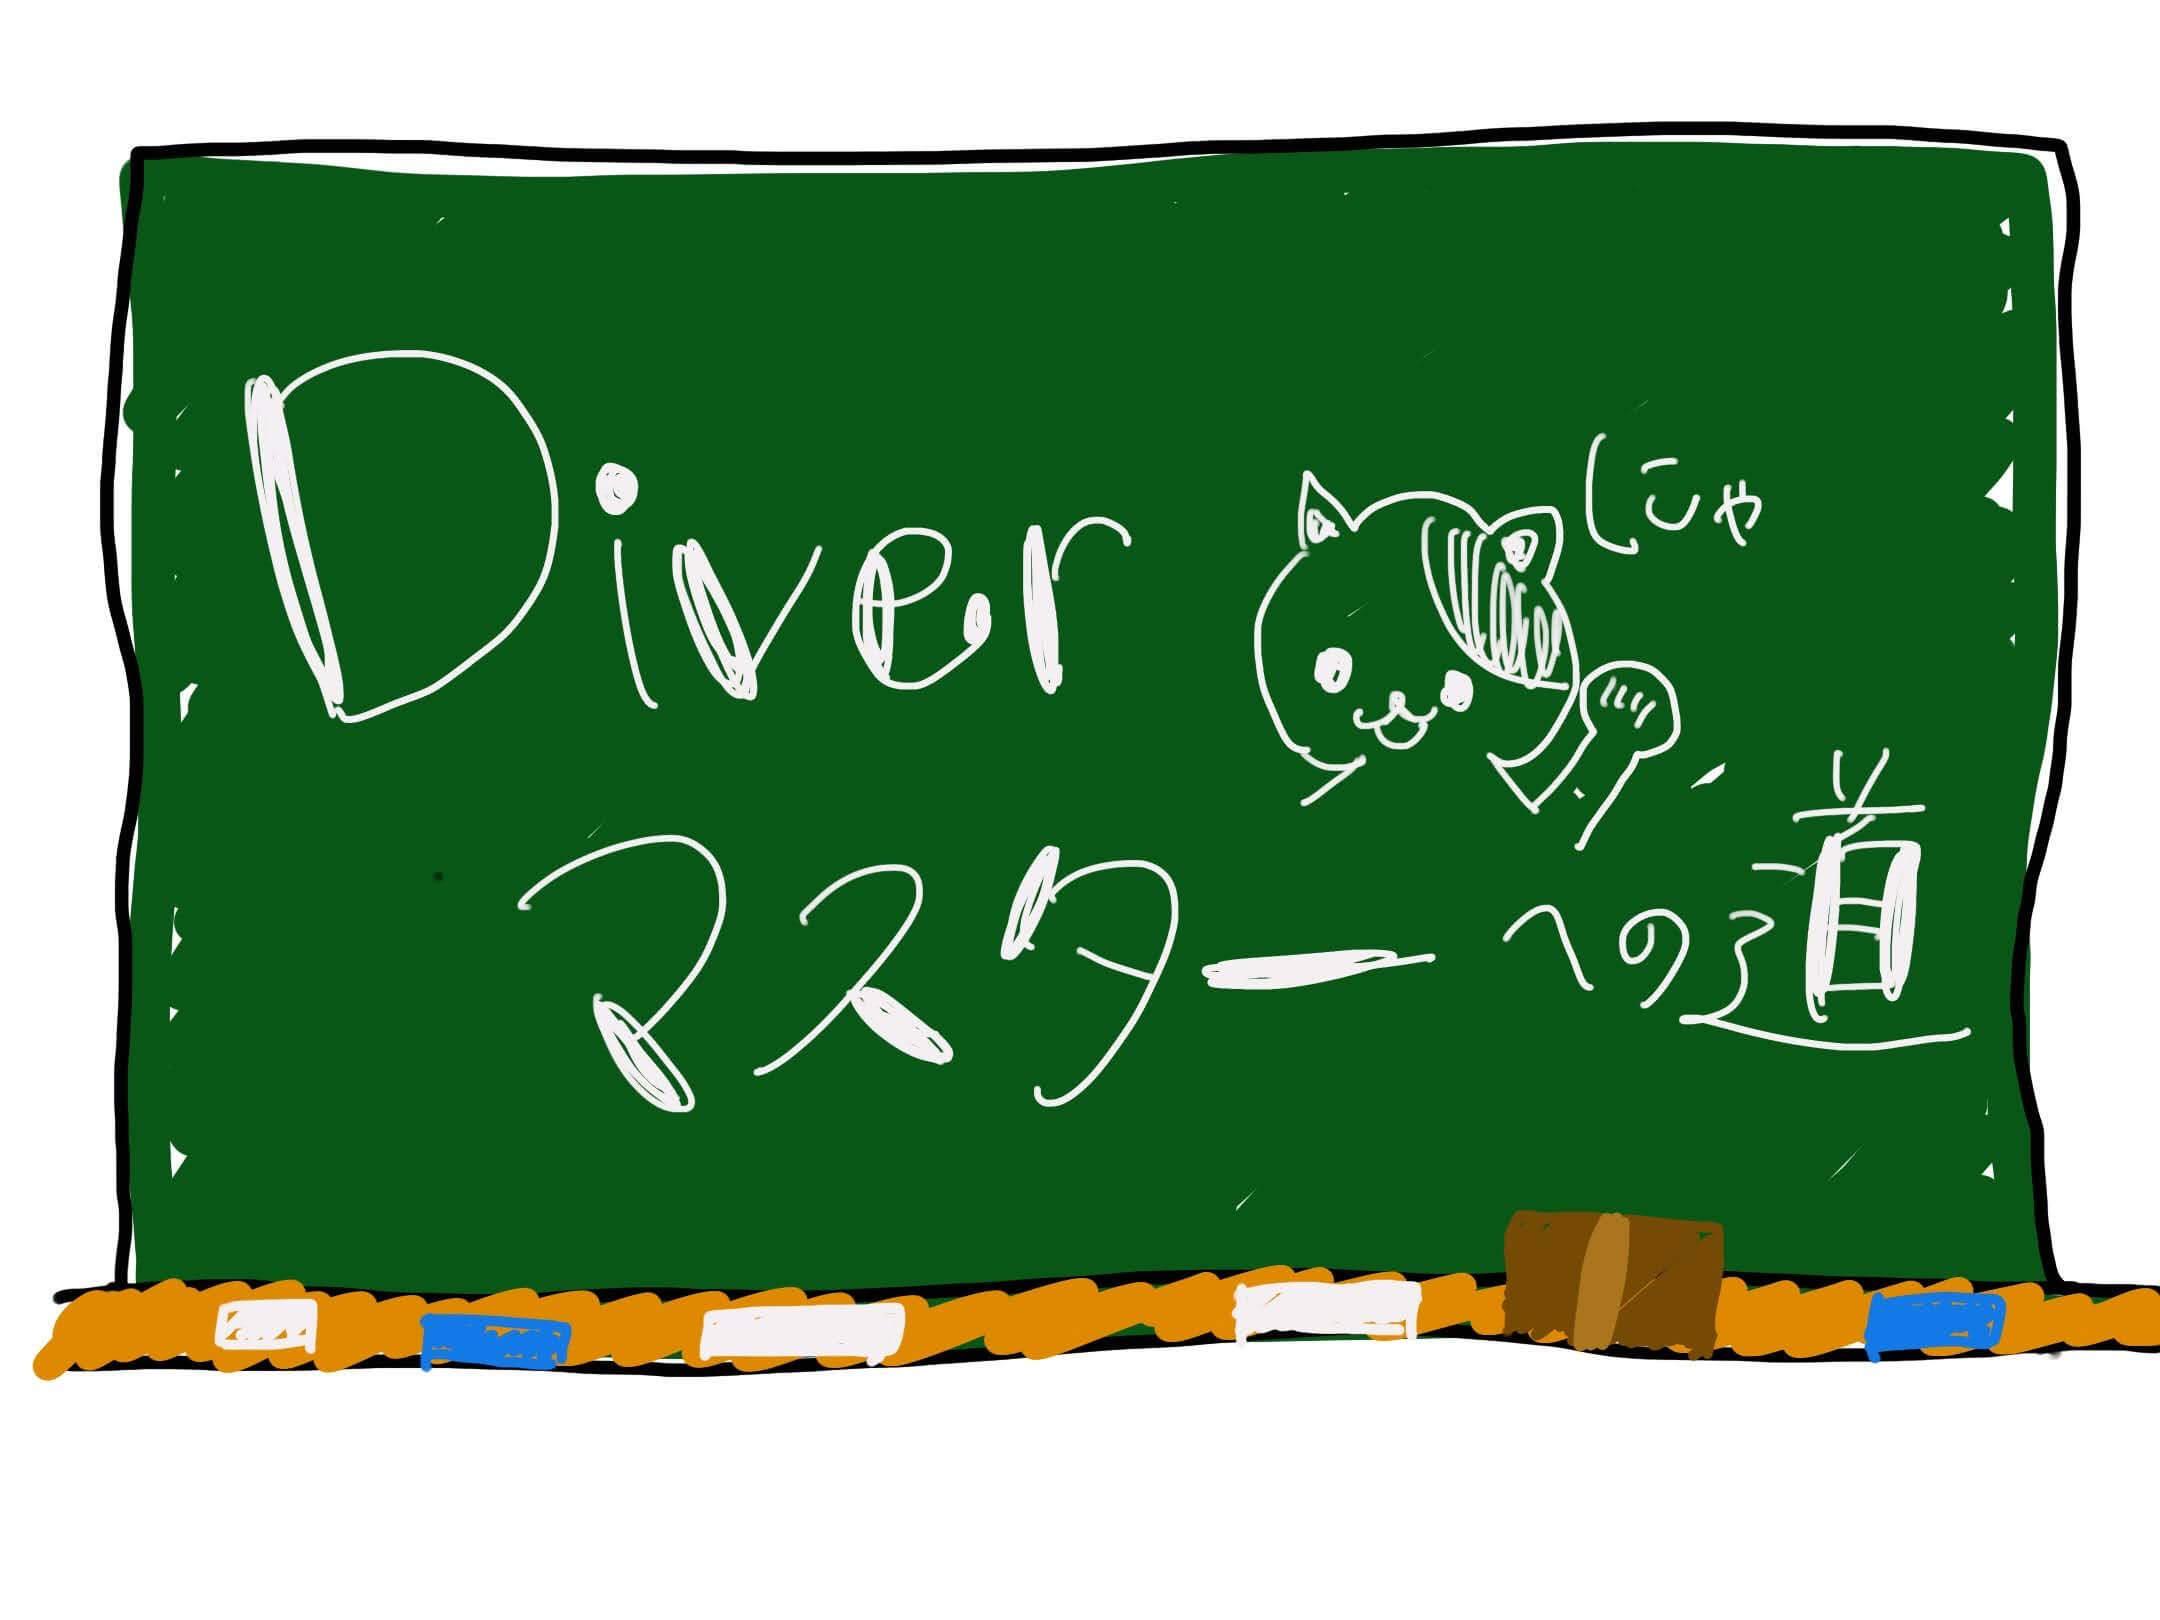 Diverを使っている人に最適な目次を表示するプラグイン /WordPress